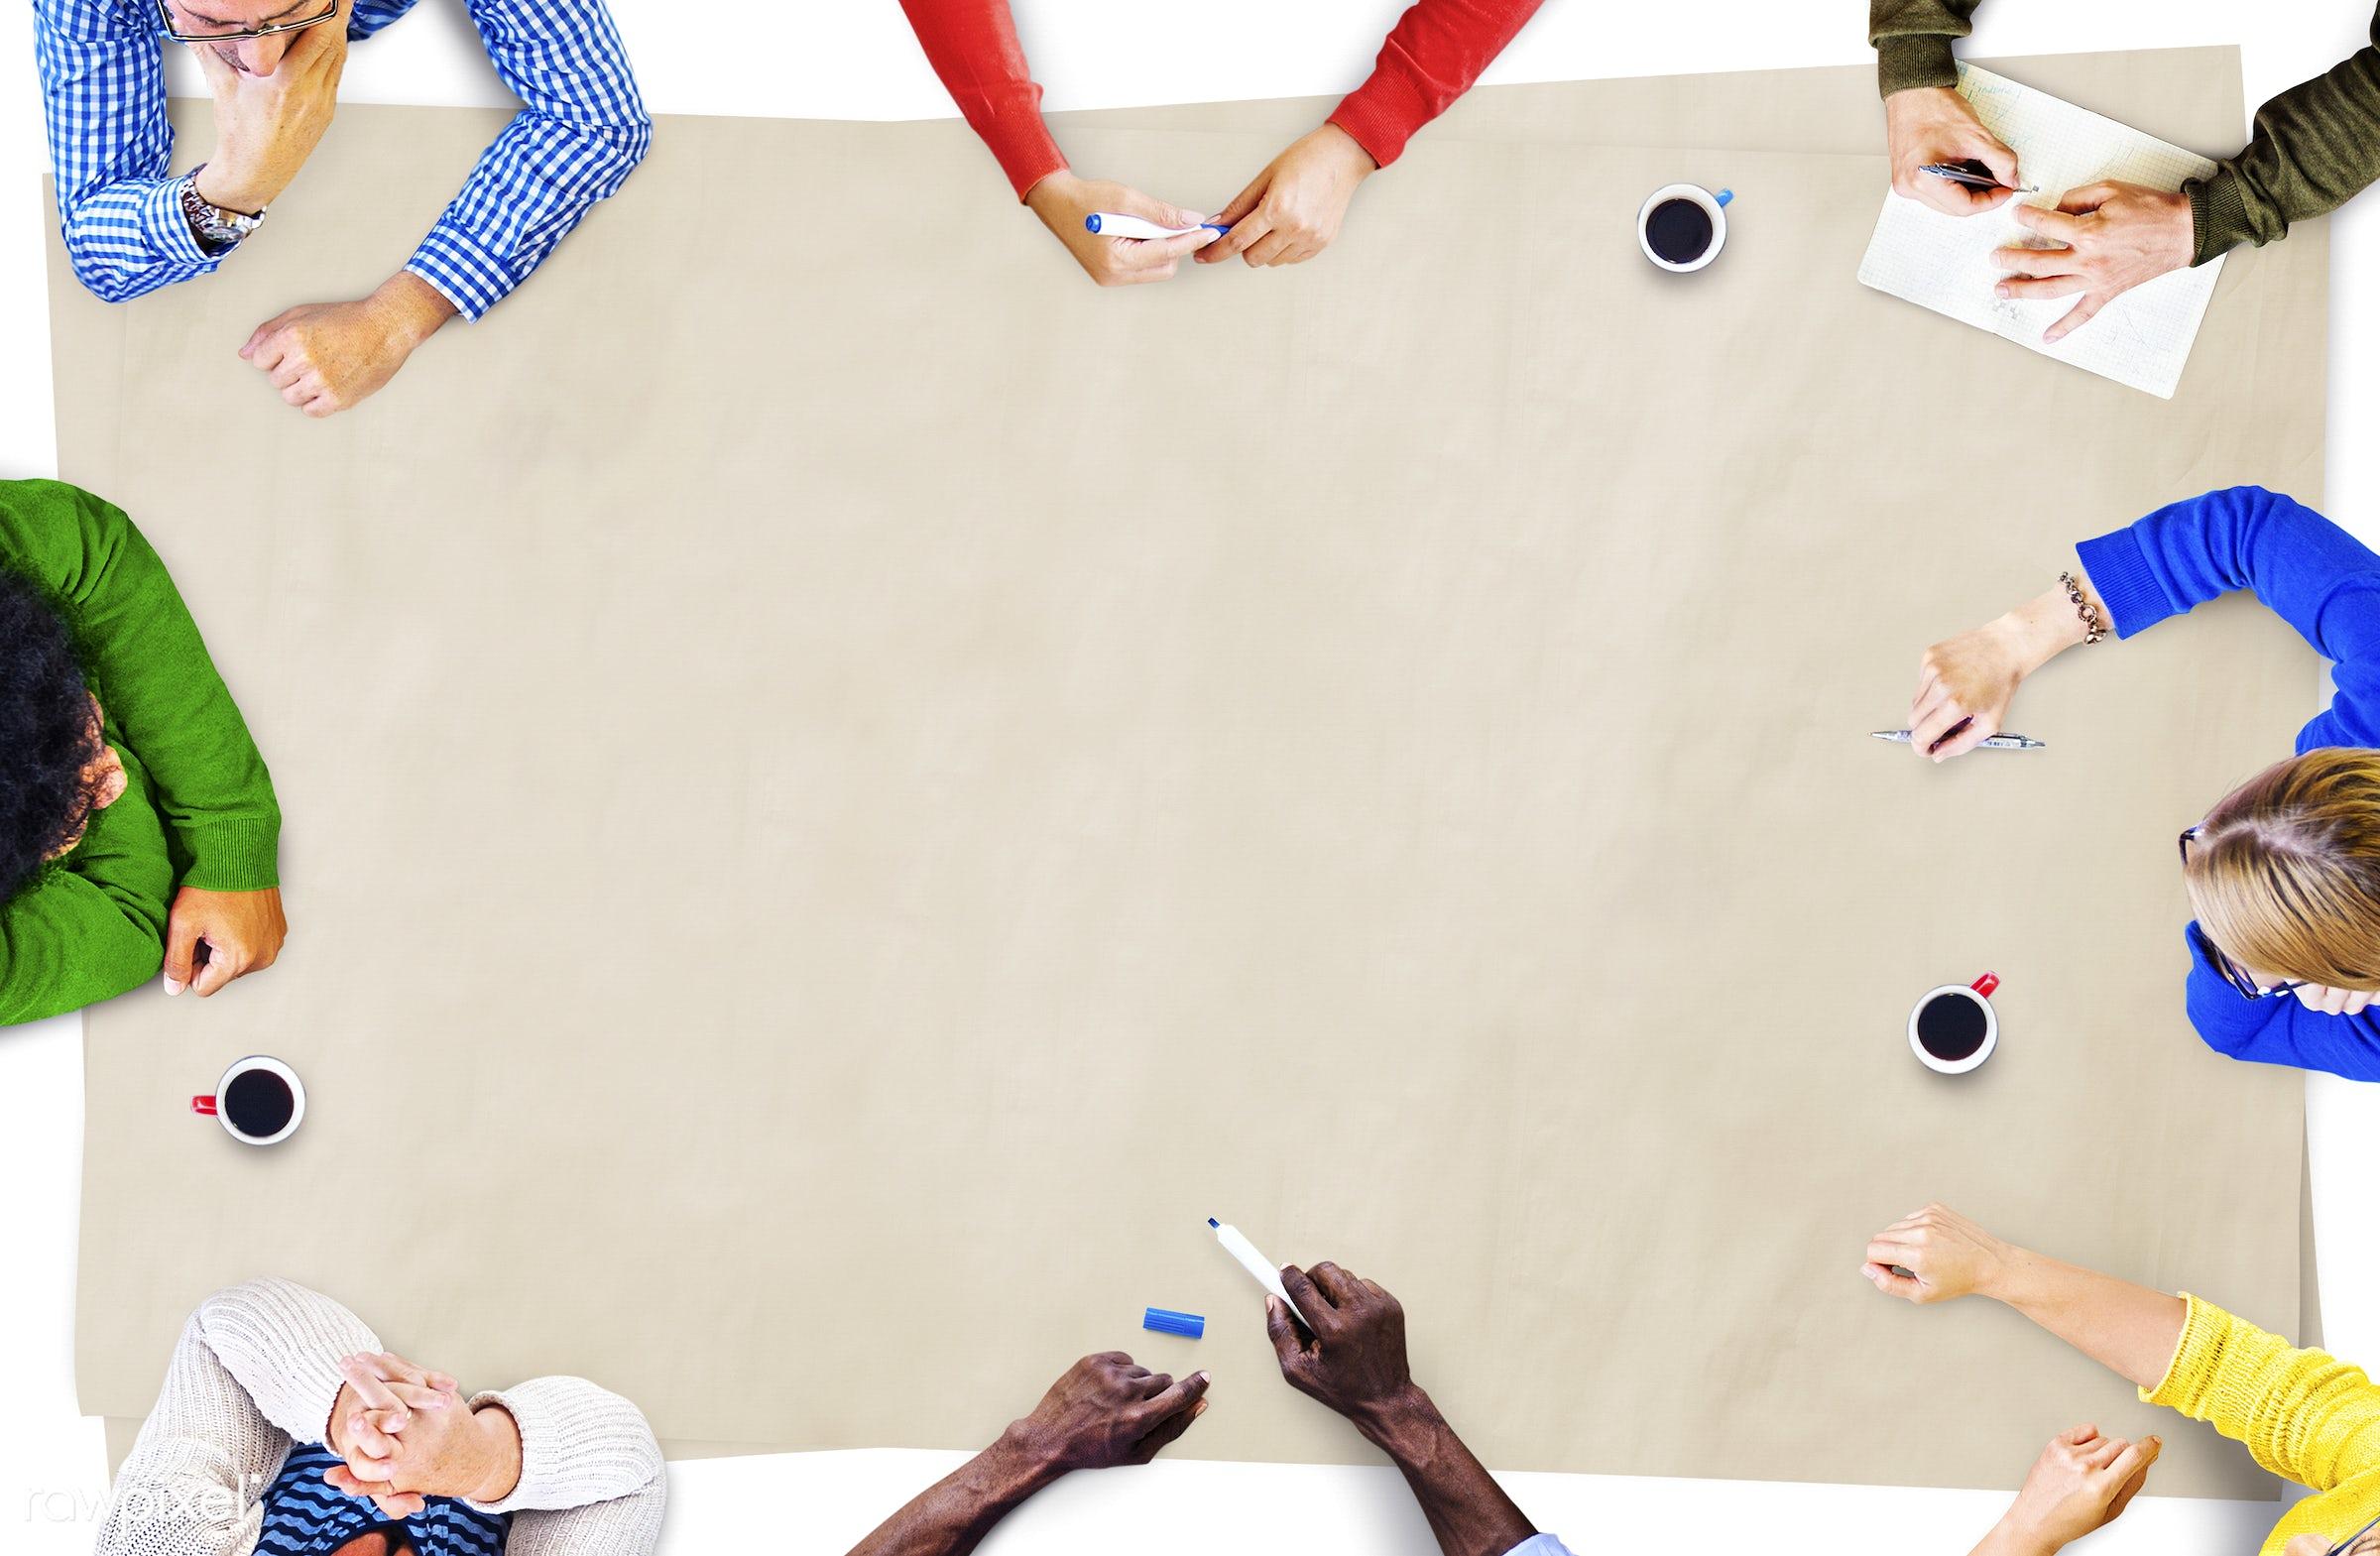 aerial view, blank, brainstorm, brainstorming, businessmen, businesswomen, coffee, college, colorful, communication,...